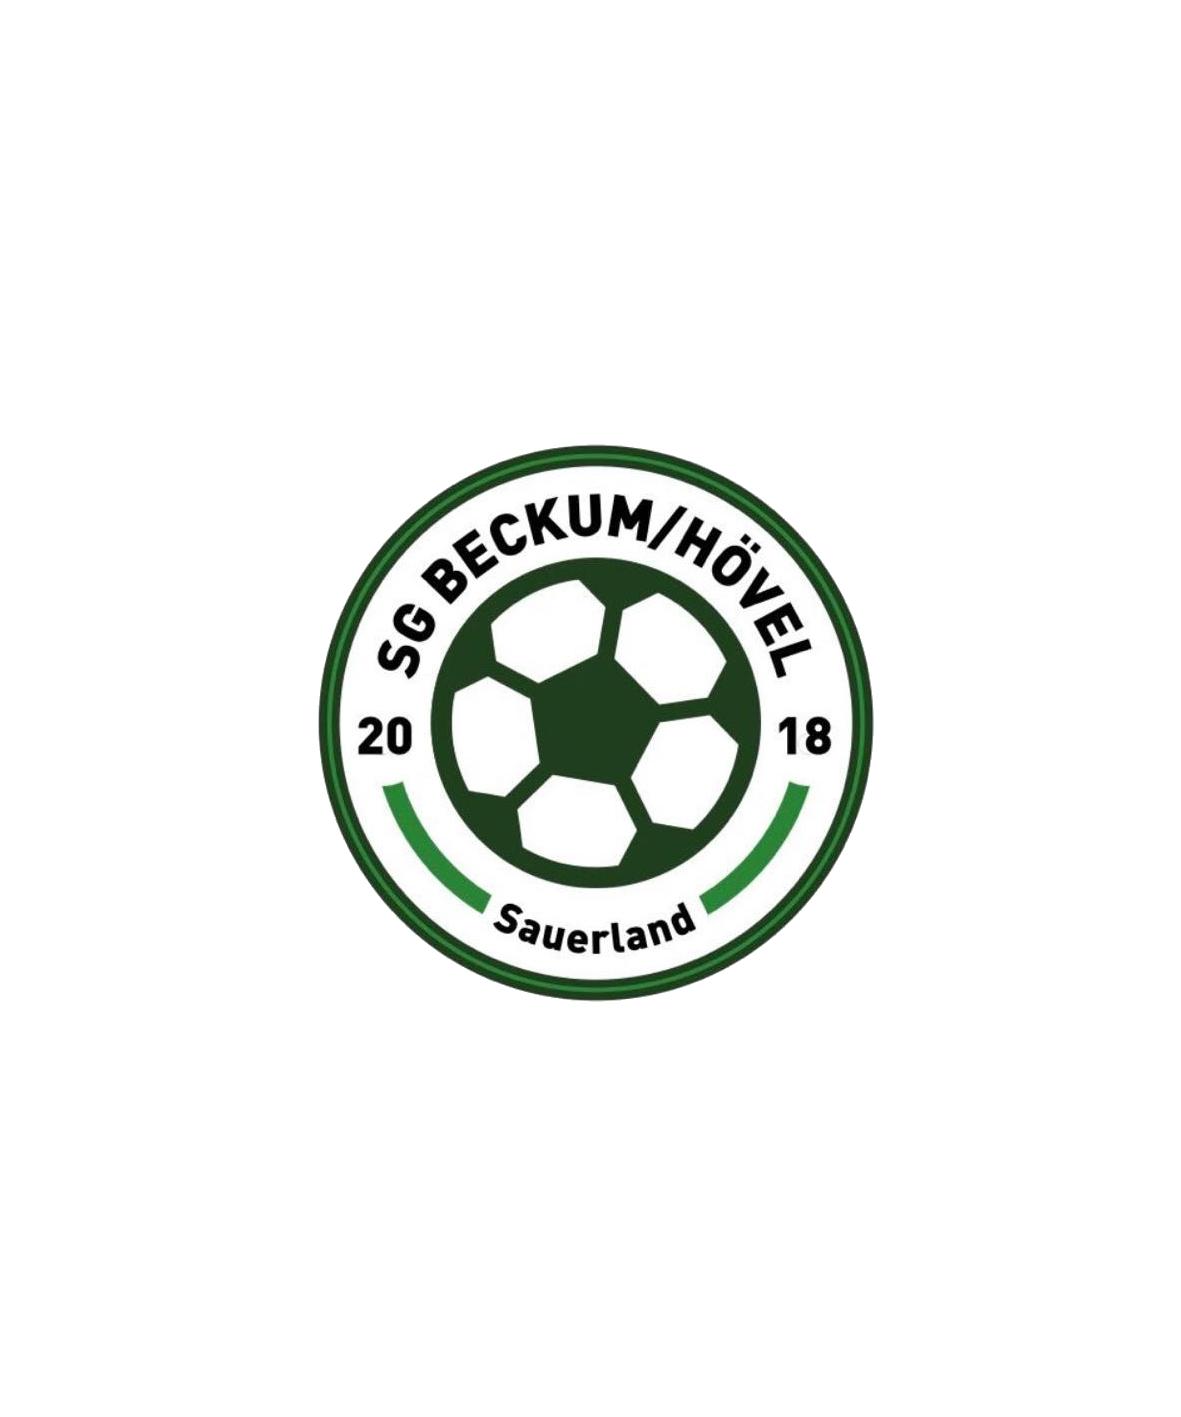 SG Beckum Hövel